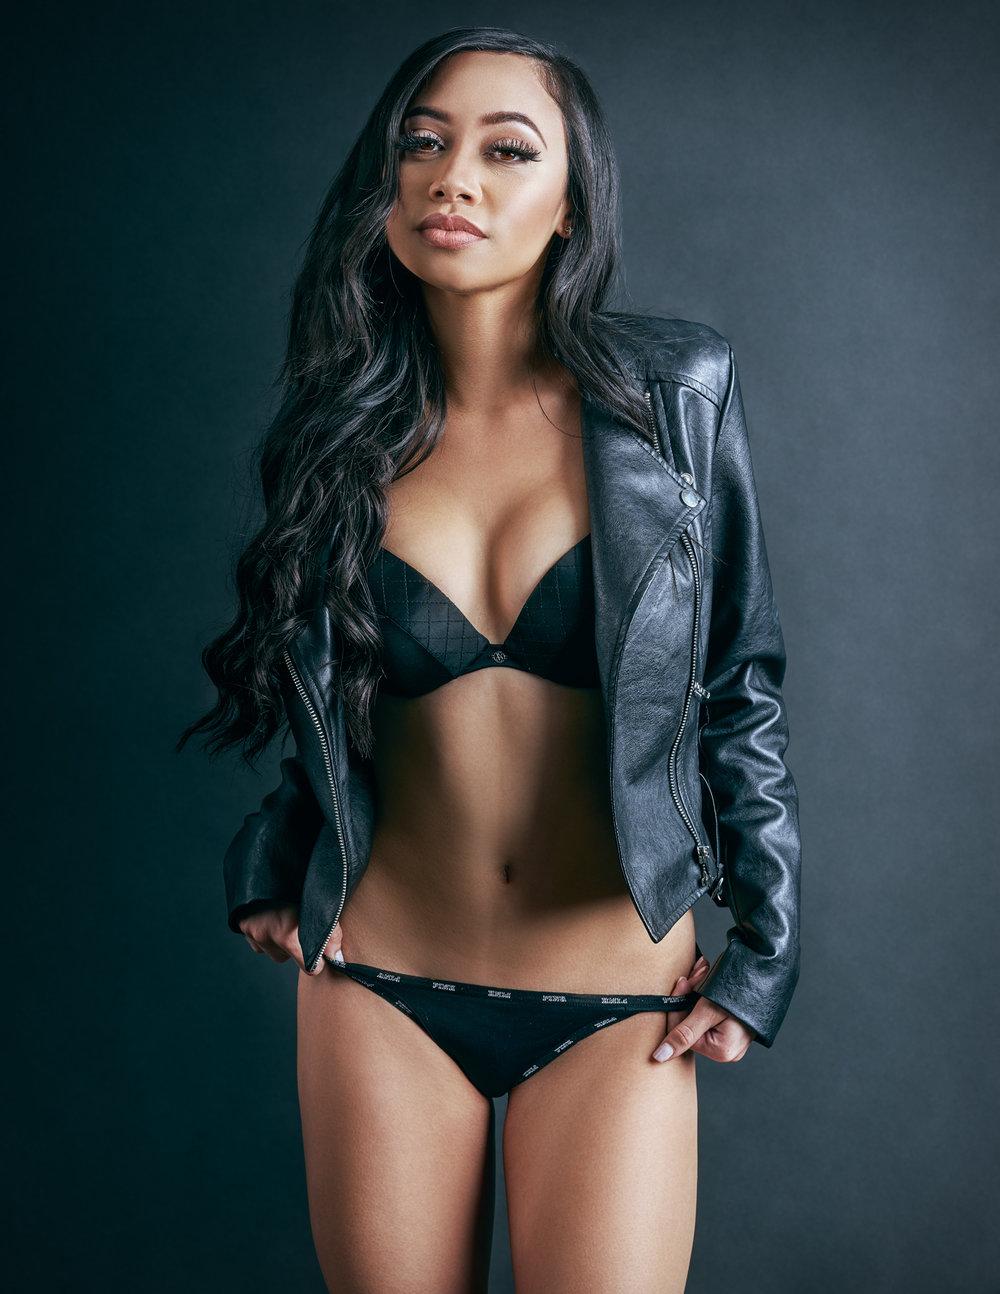 Beauty Model Alexxa by Arizona Fashion Portrait Photographer Chad Weed